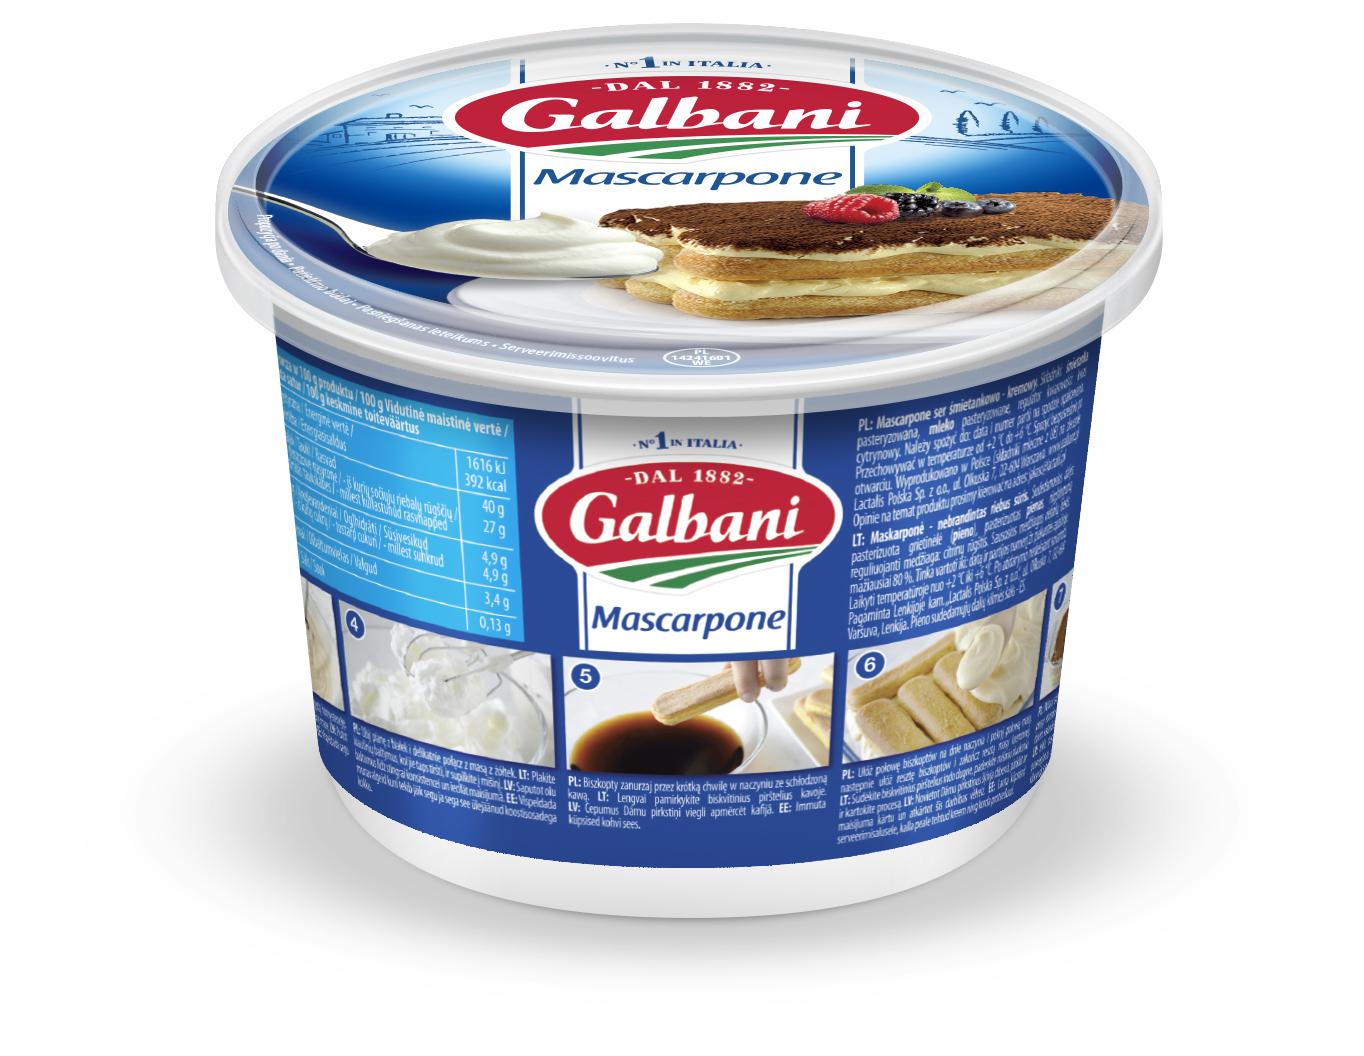 Mascarpone Galbani 500g - Galbani